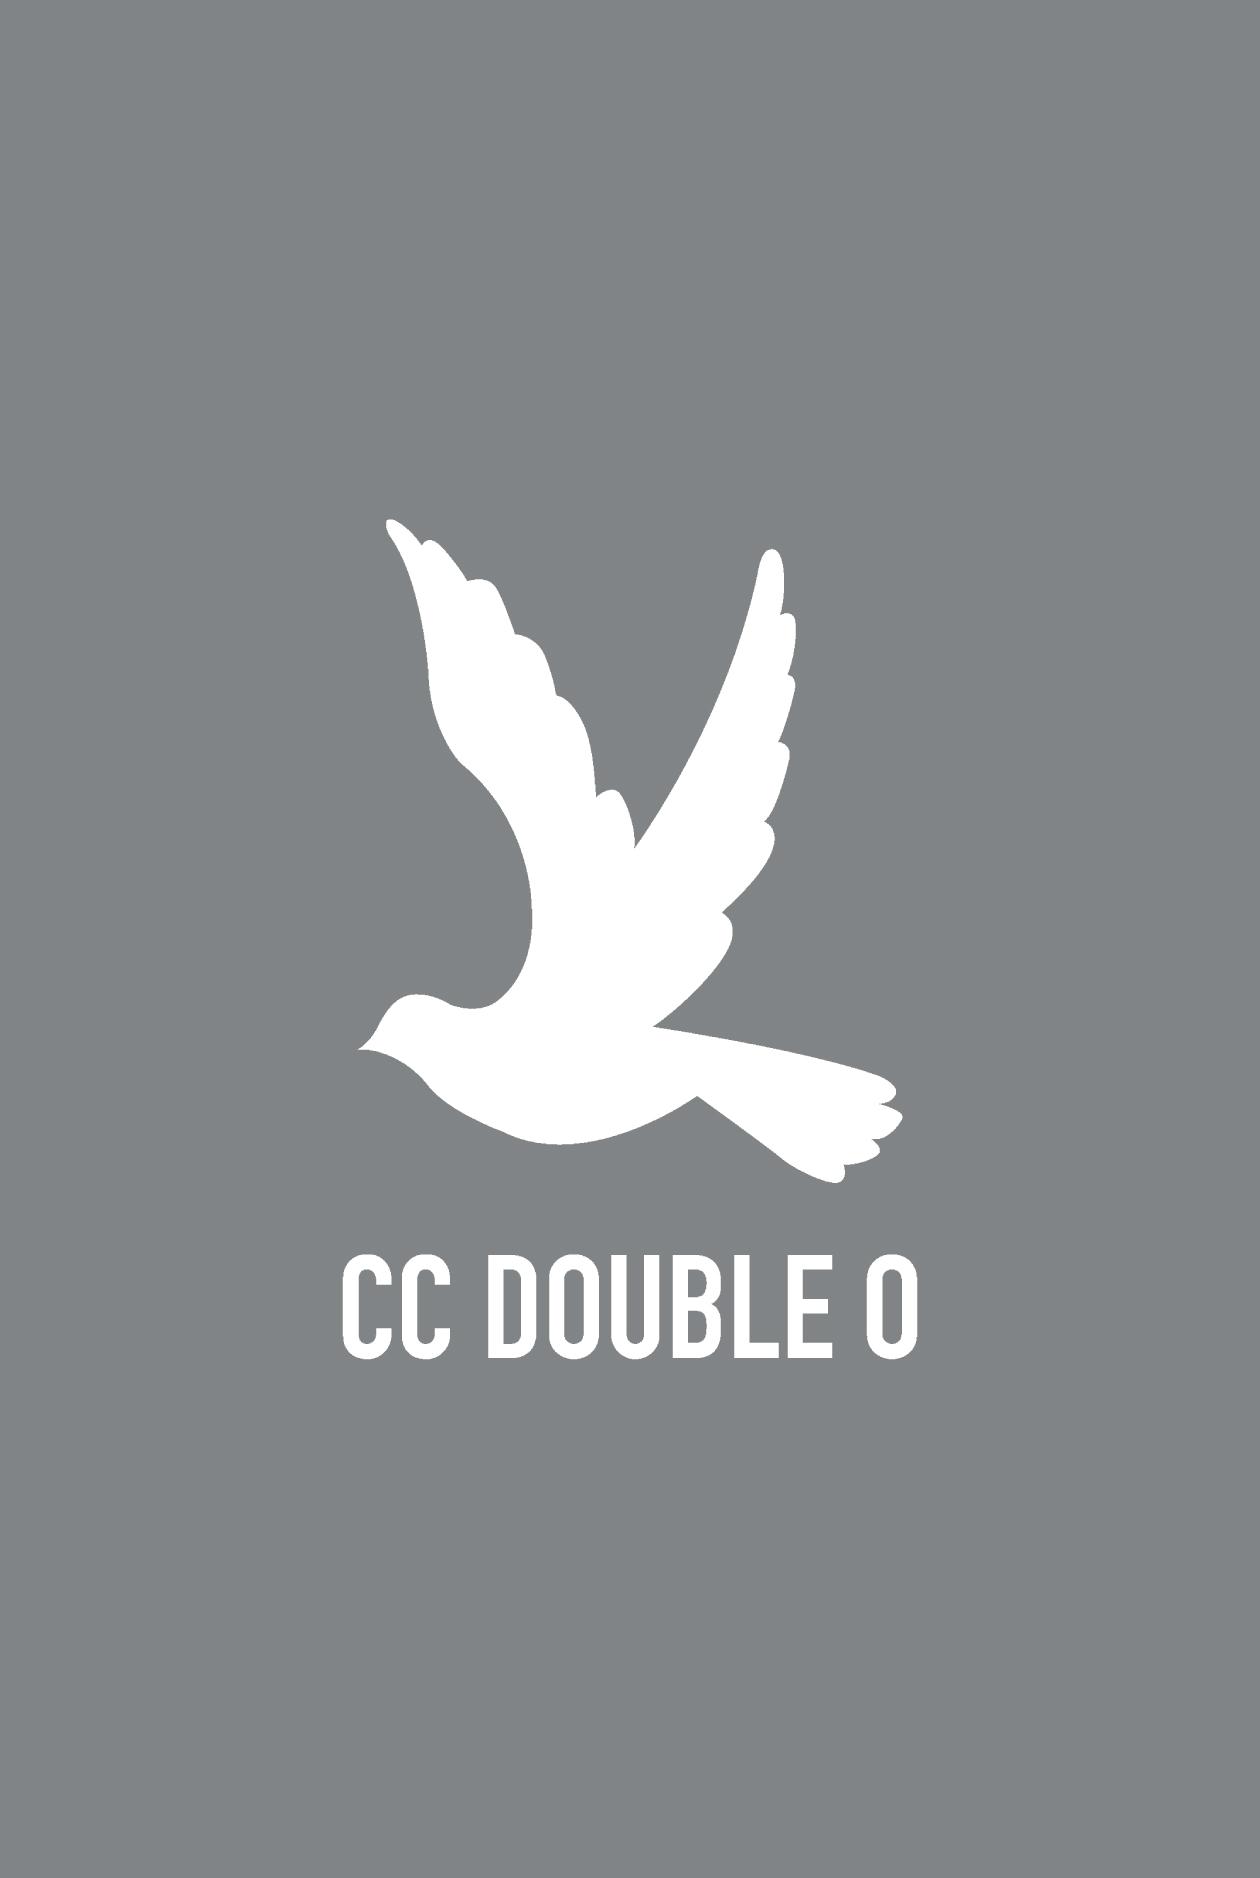 CC DOUBLE O Camouflage Flip Flops